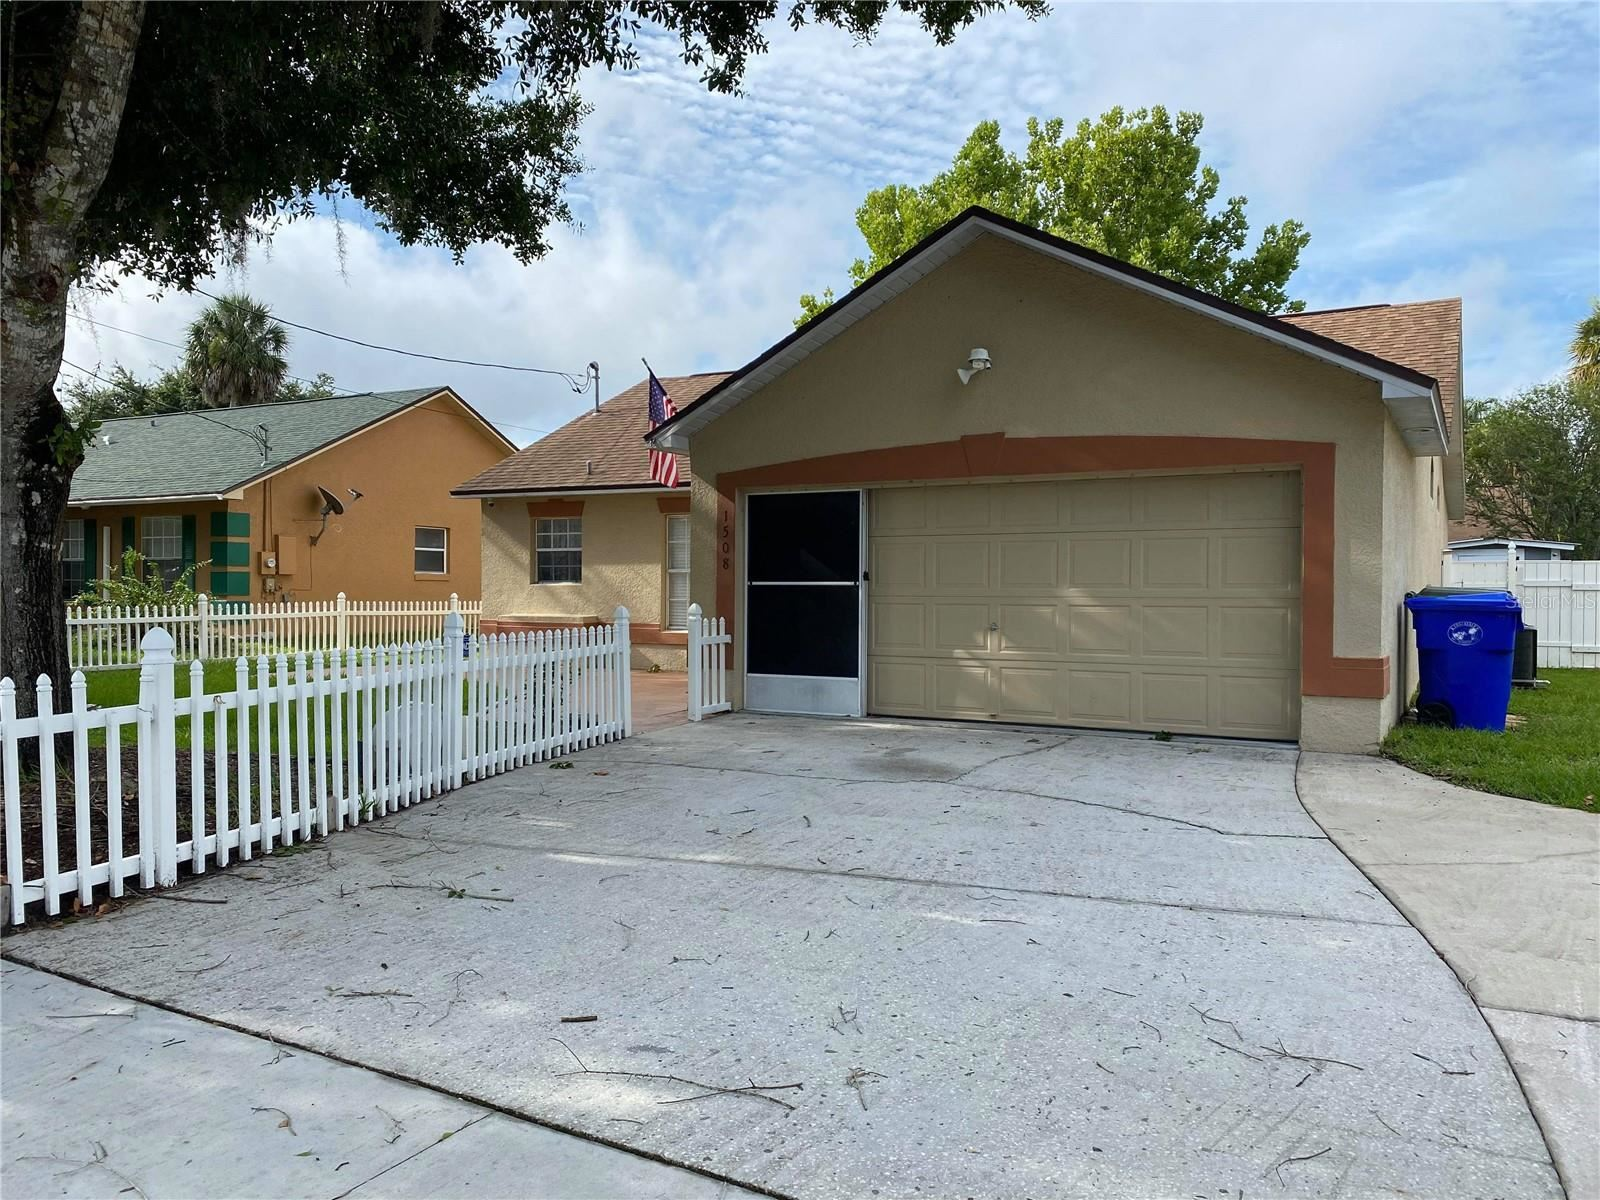 Photo of 1508 MABBETTE STREET, KISSIMMEE, FL 34741 (MLS # S5052532)